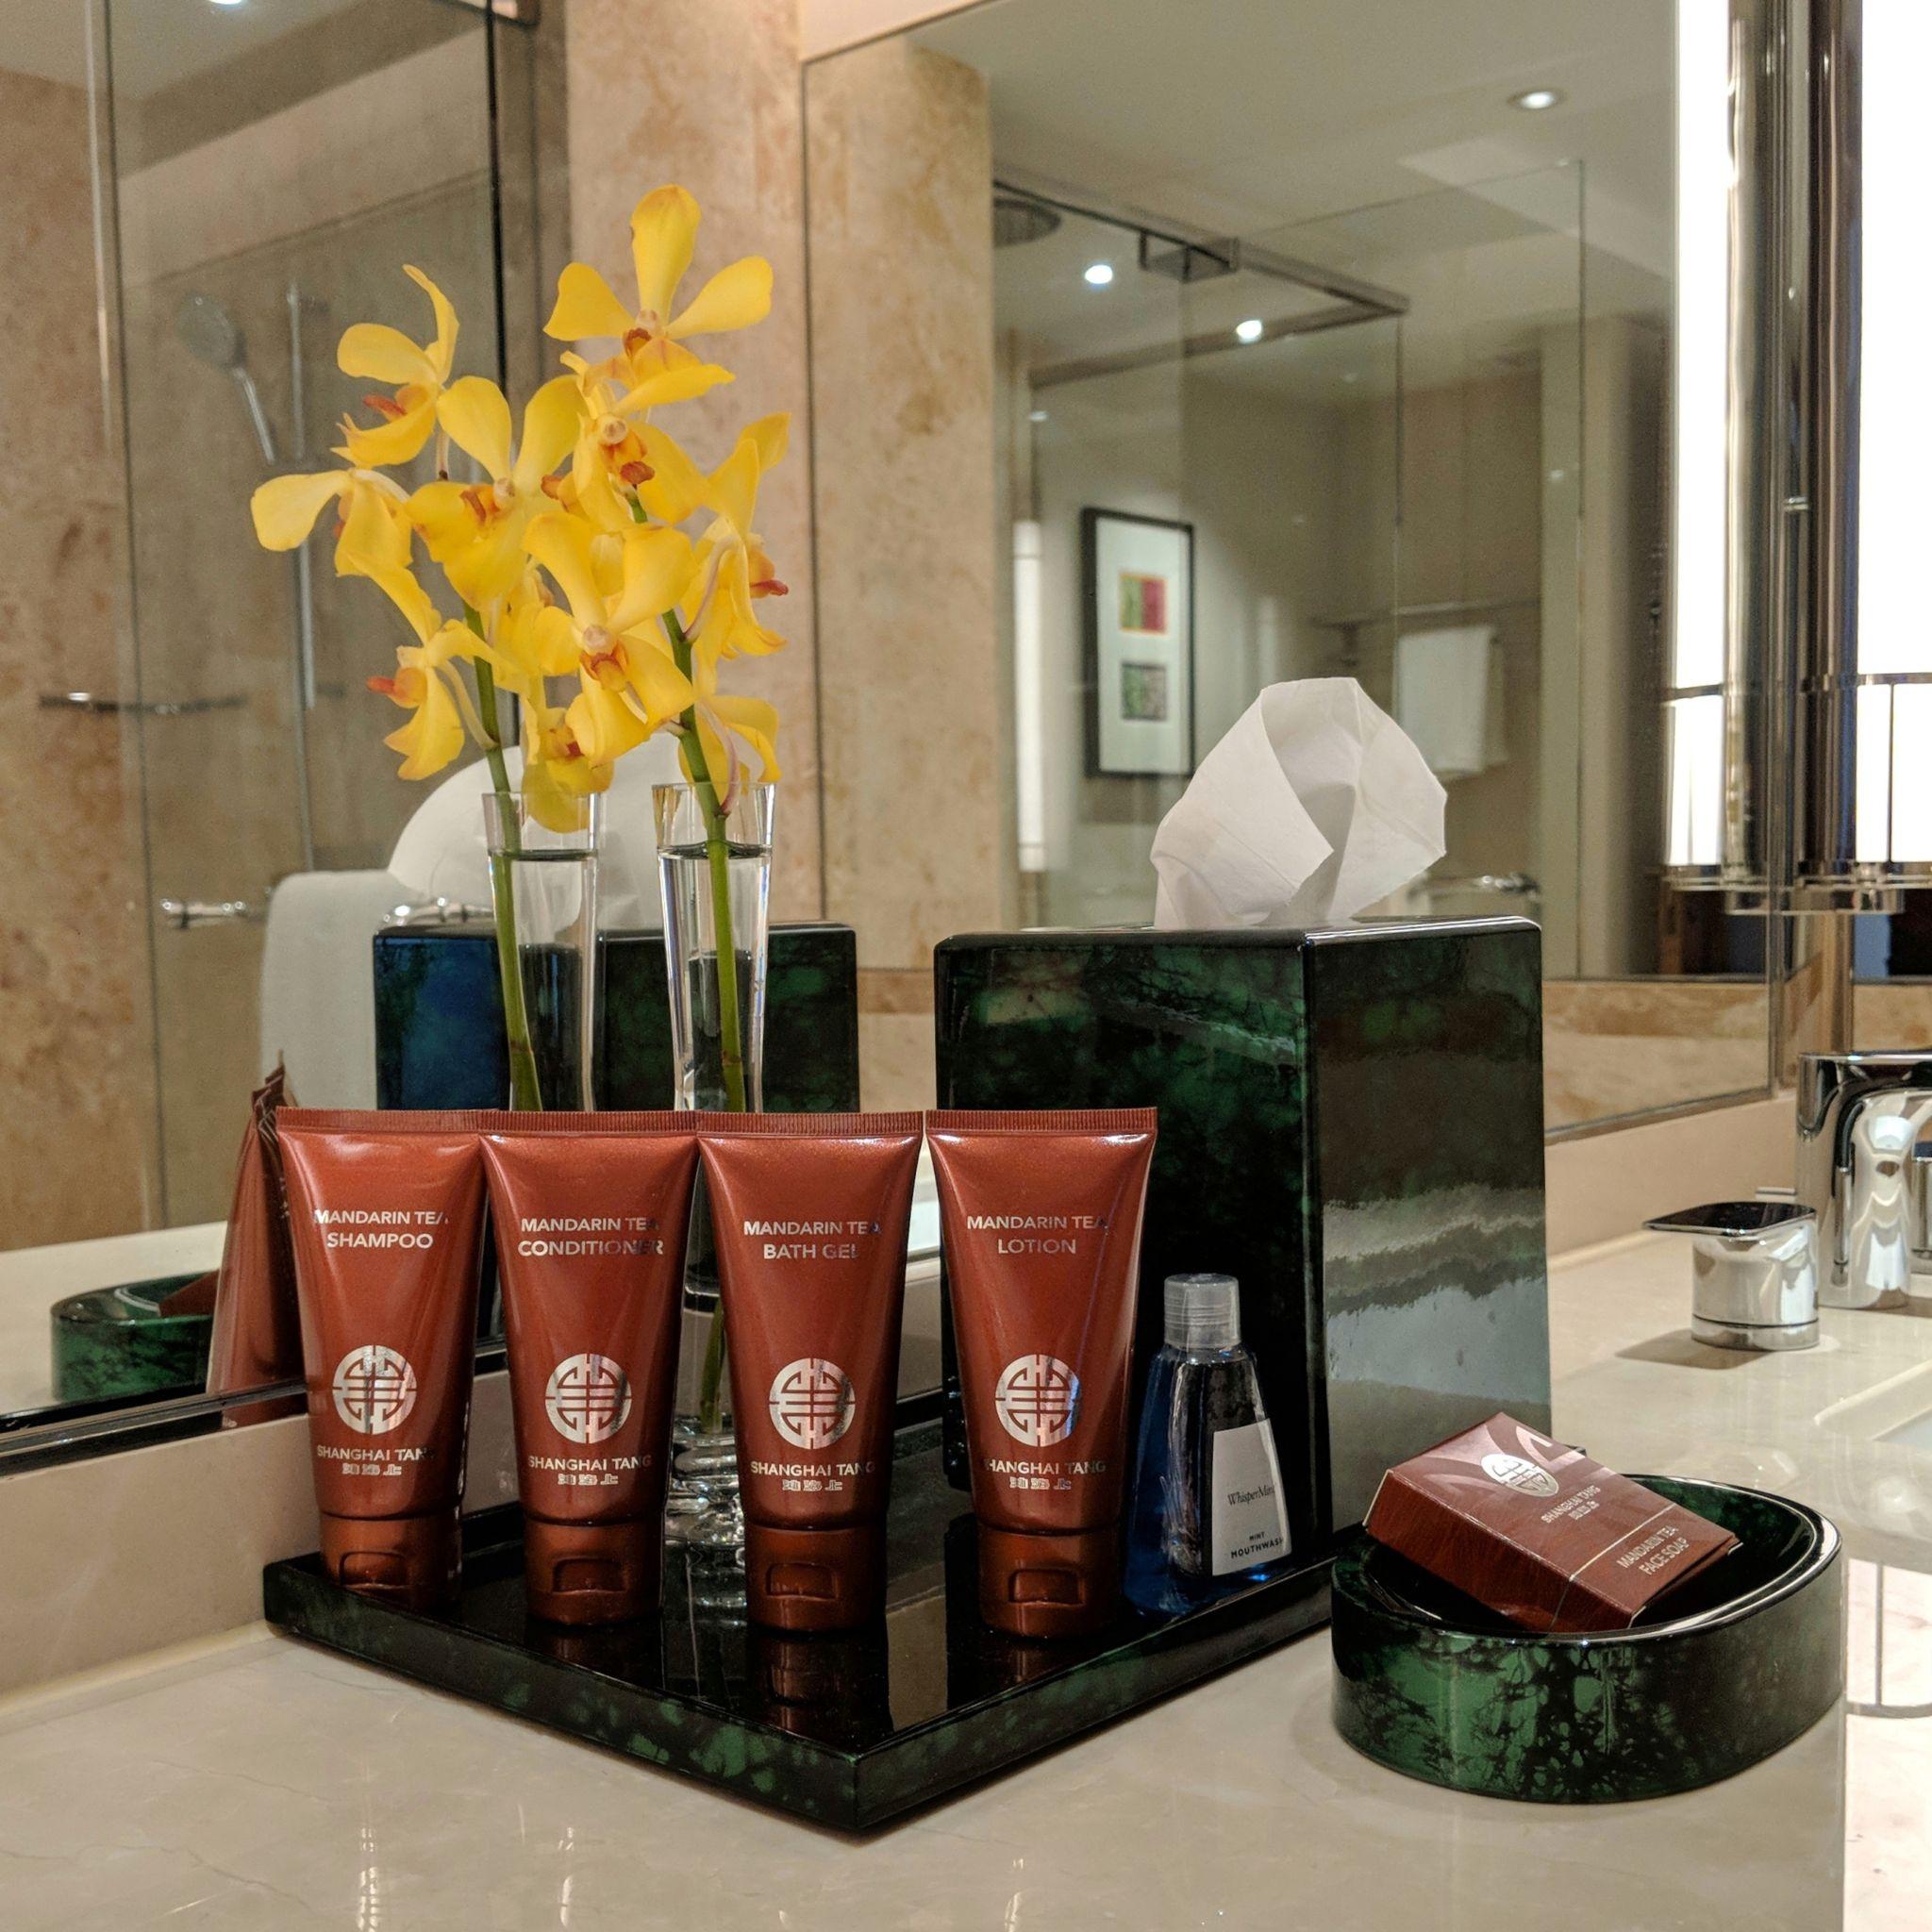 conrad centennial singapore shanghai tang bathroom amenities